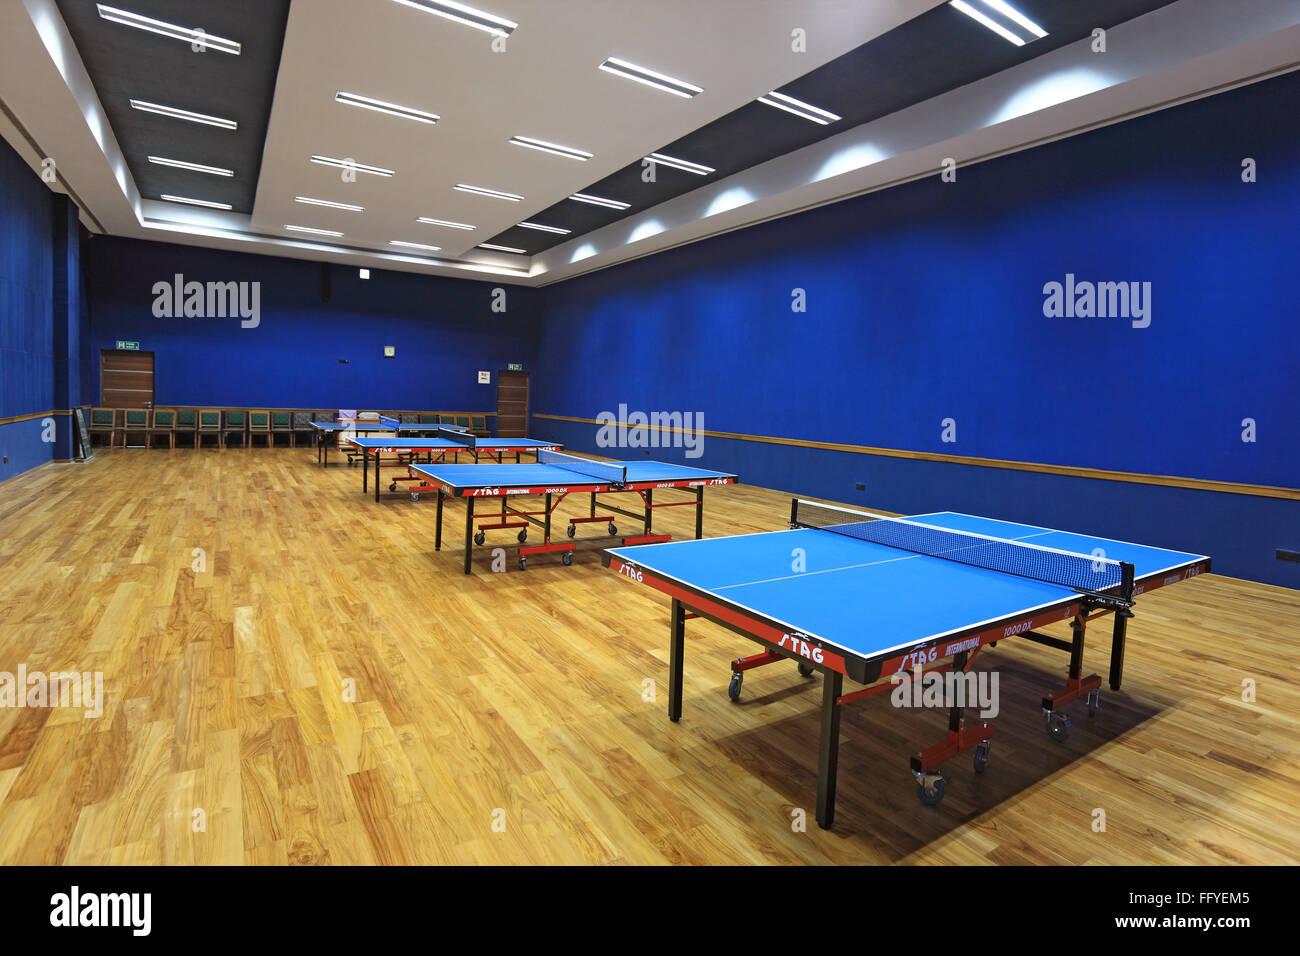 Table tennis hall of national sports club ; Worli ; Bombay Mumbai ; Maharashtra ; India - Stock Image